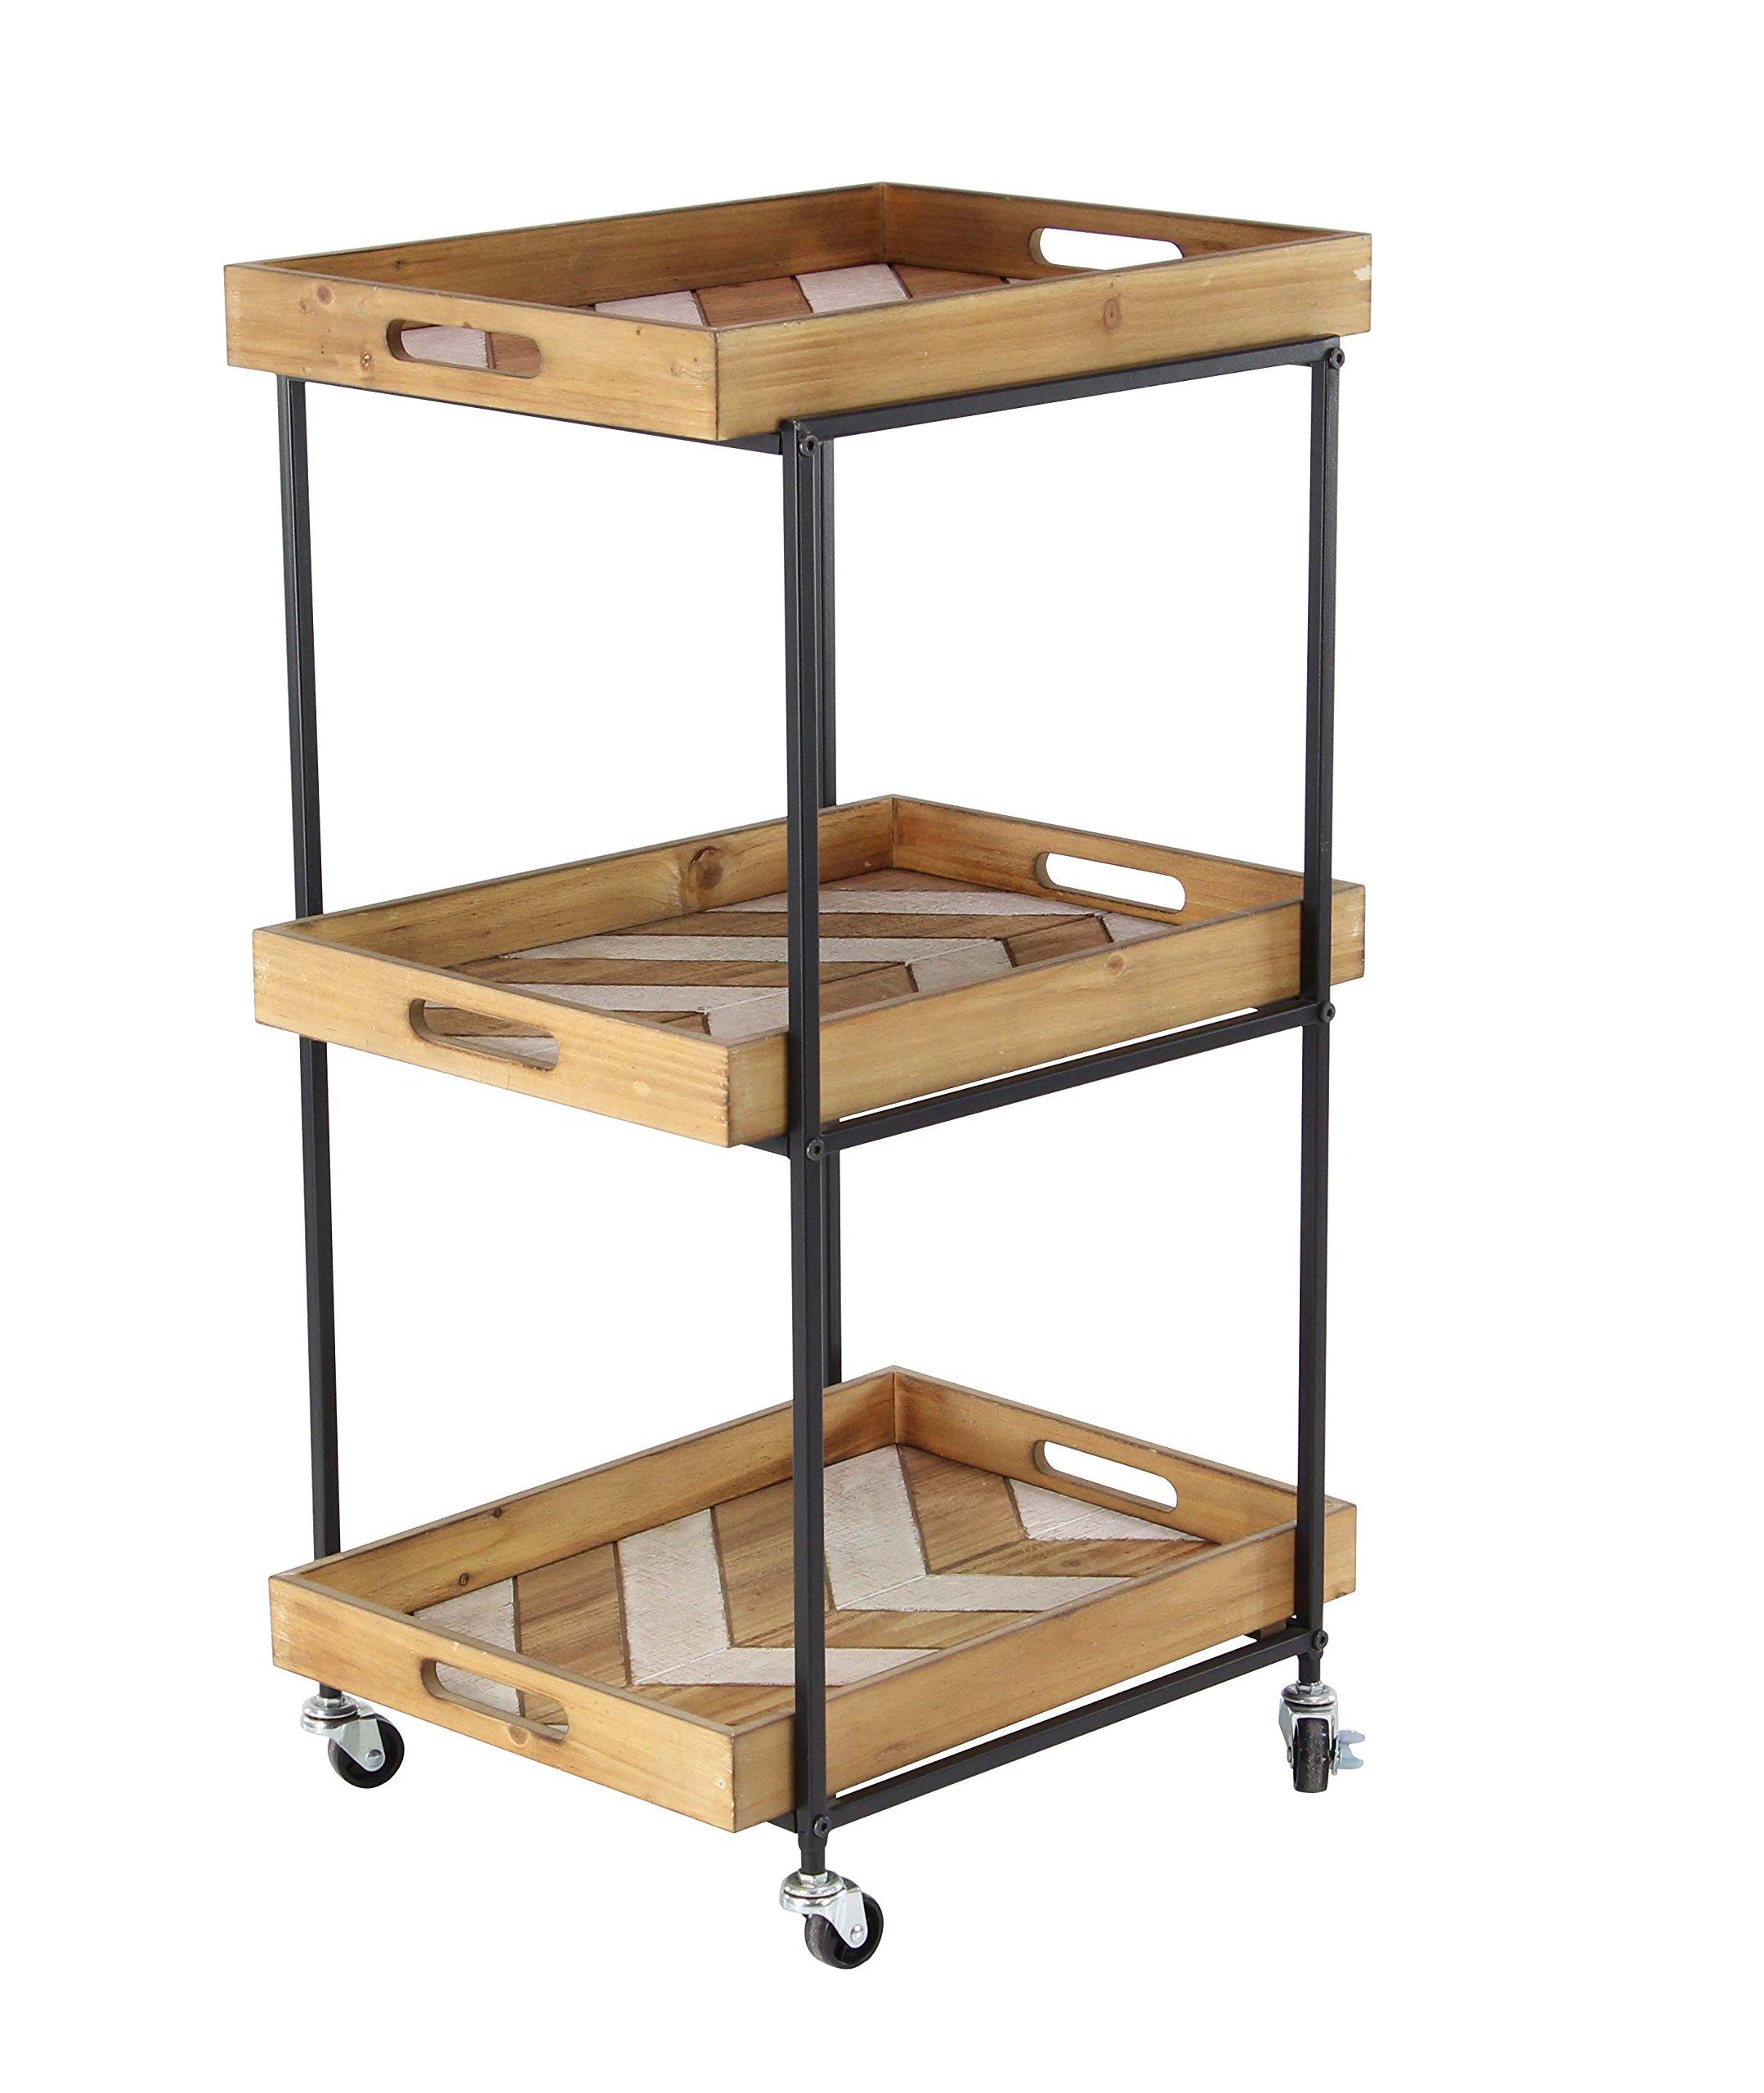 Deco 79 94684 Utility Cart Beige/Gray/White/Silver